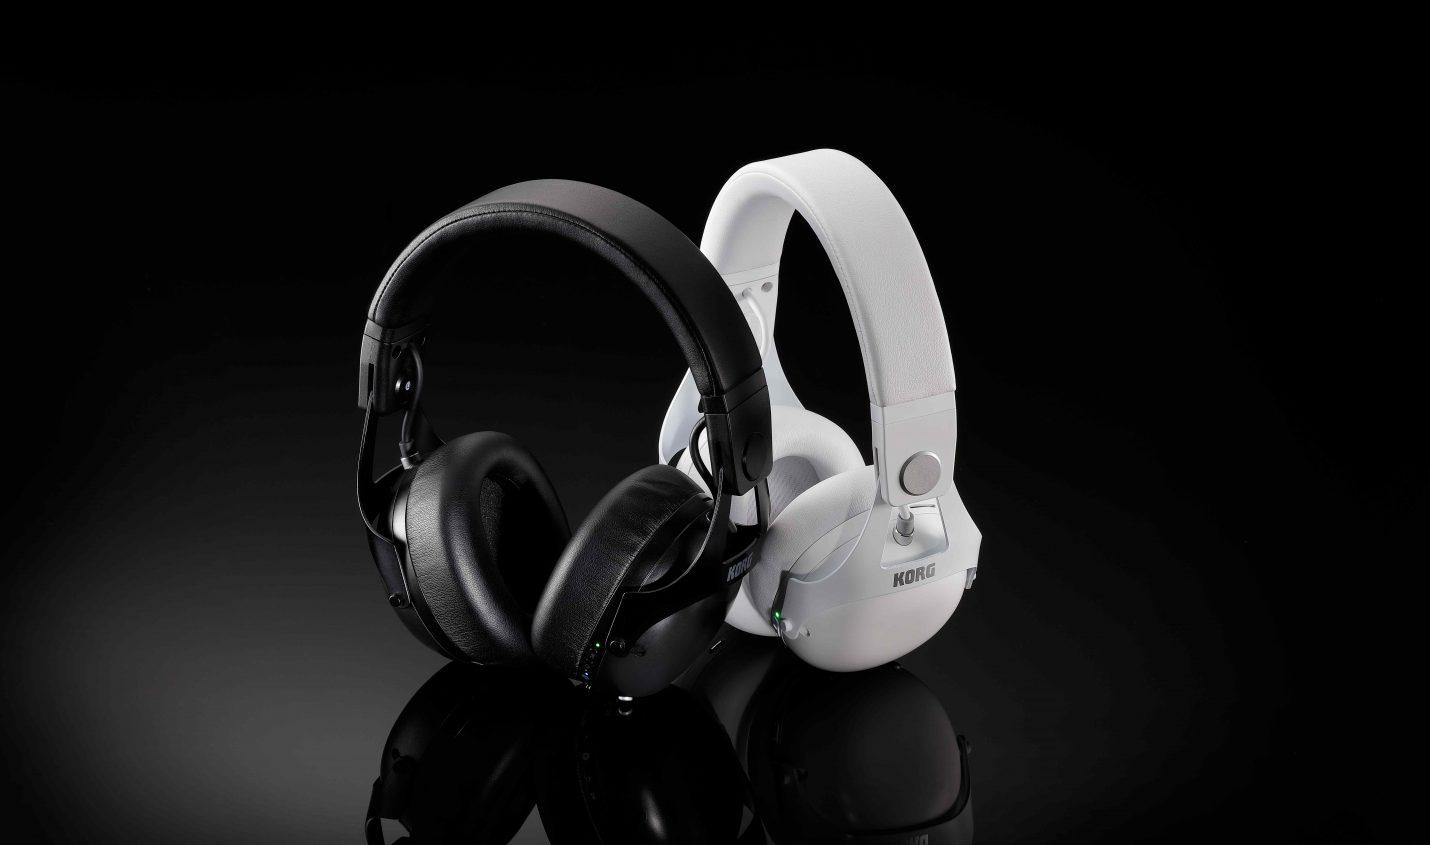 Neu: Korg stellt DJ-Kopfhörer mit Noise-Cancelling vor